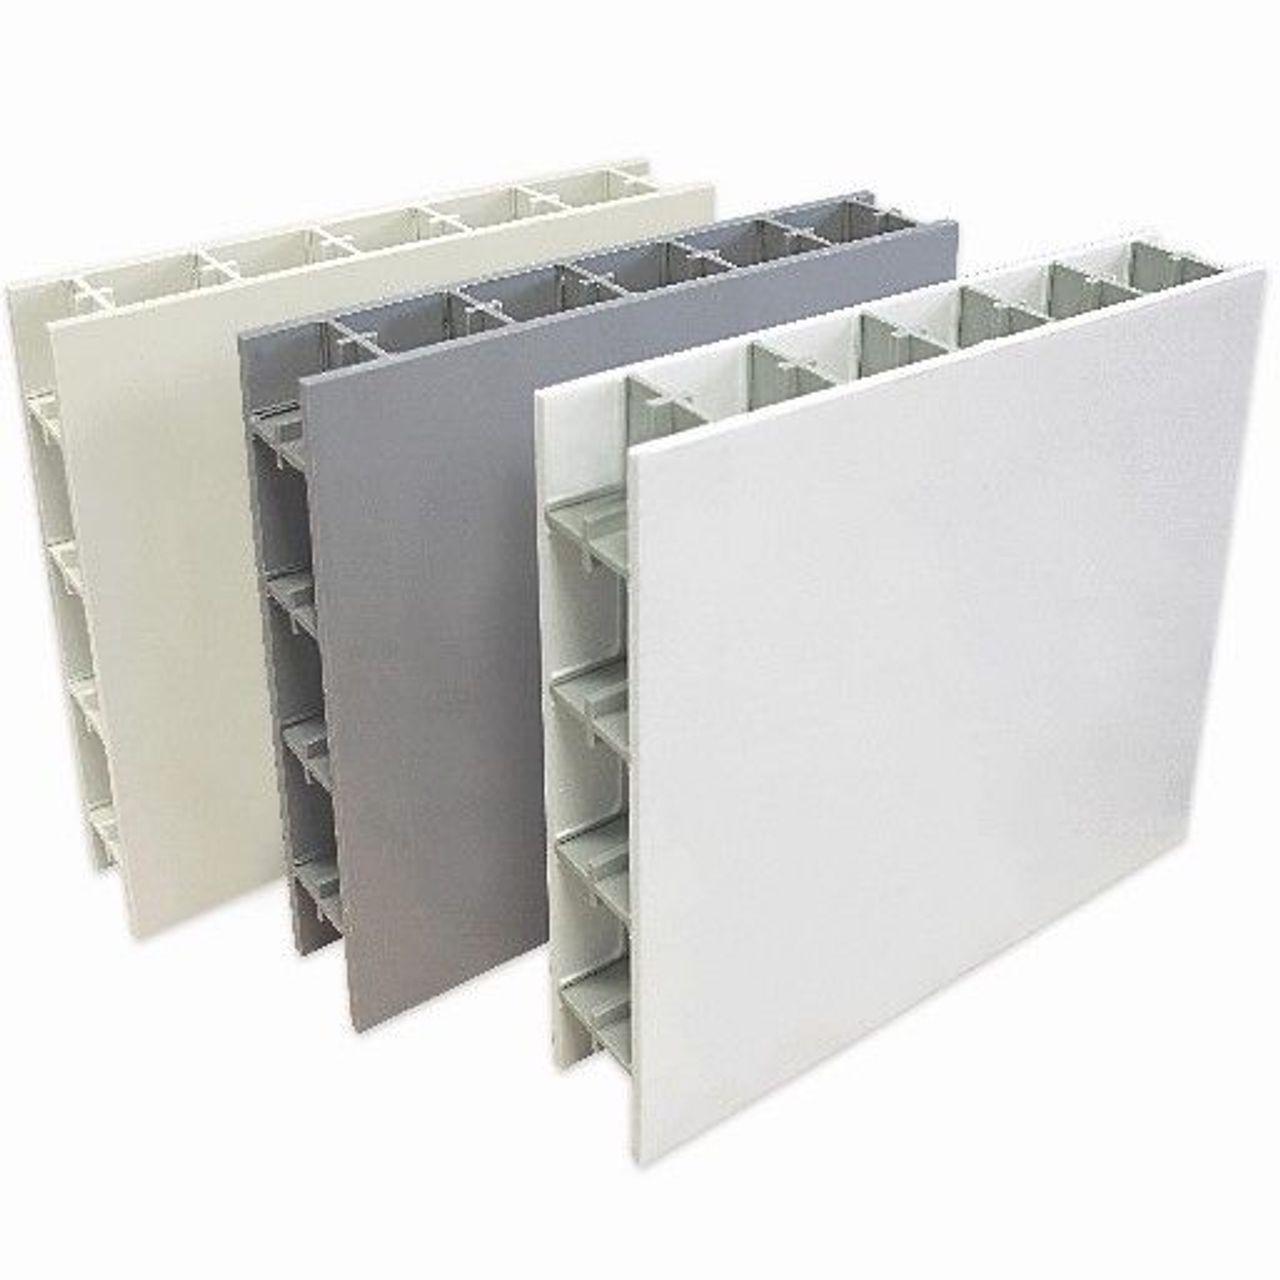 PP CubX® constructie plaat